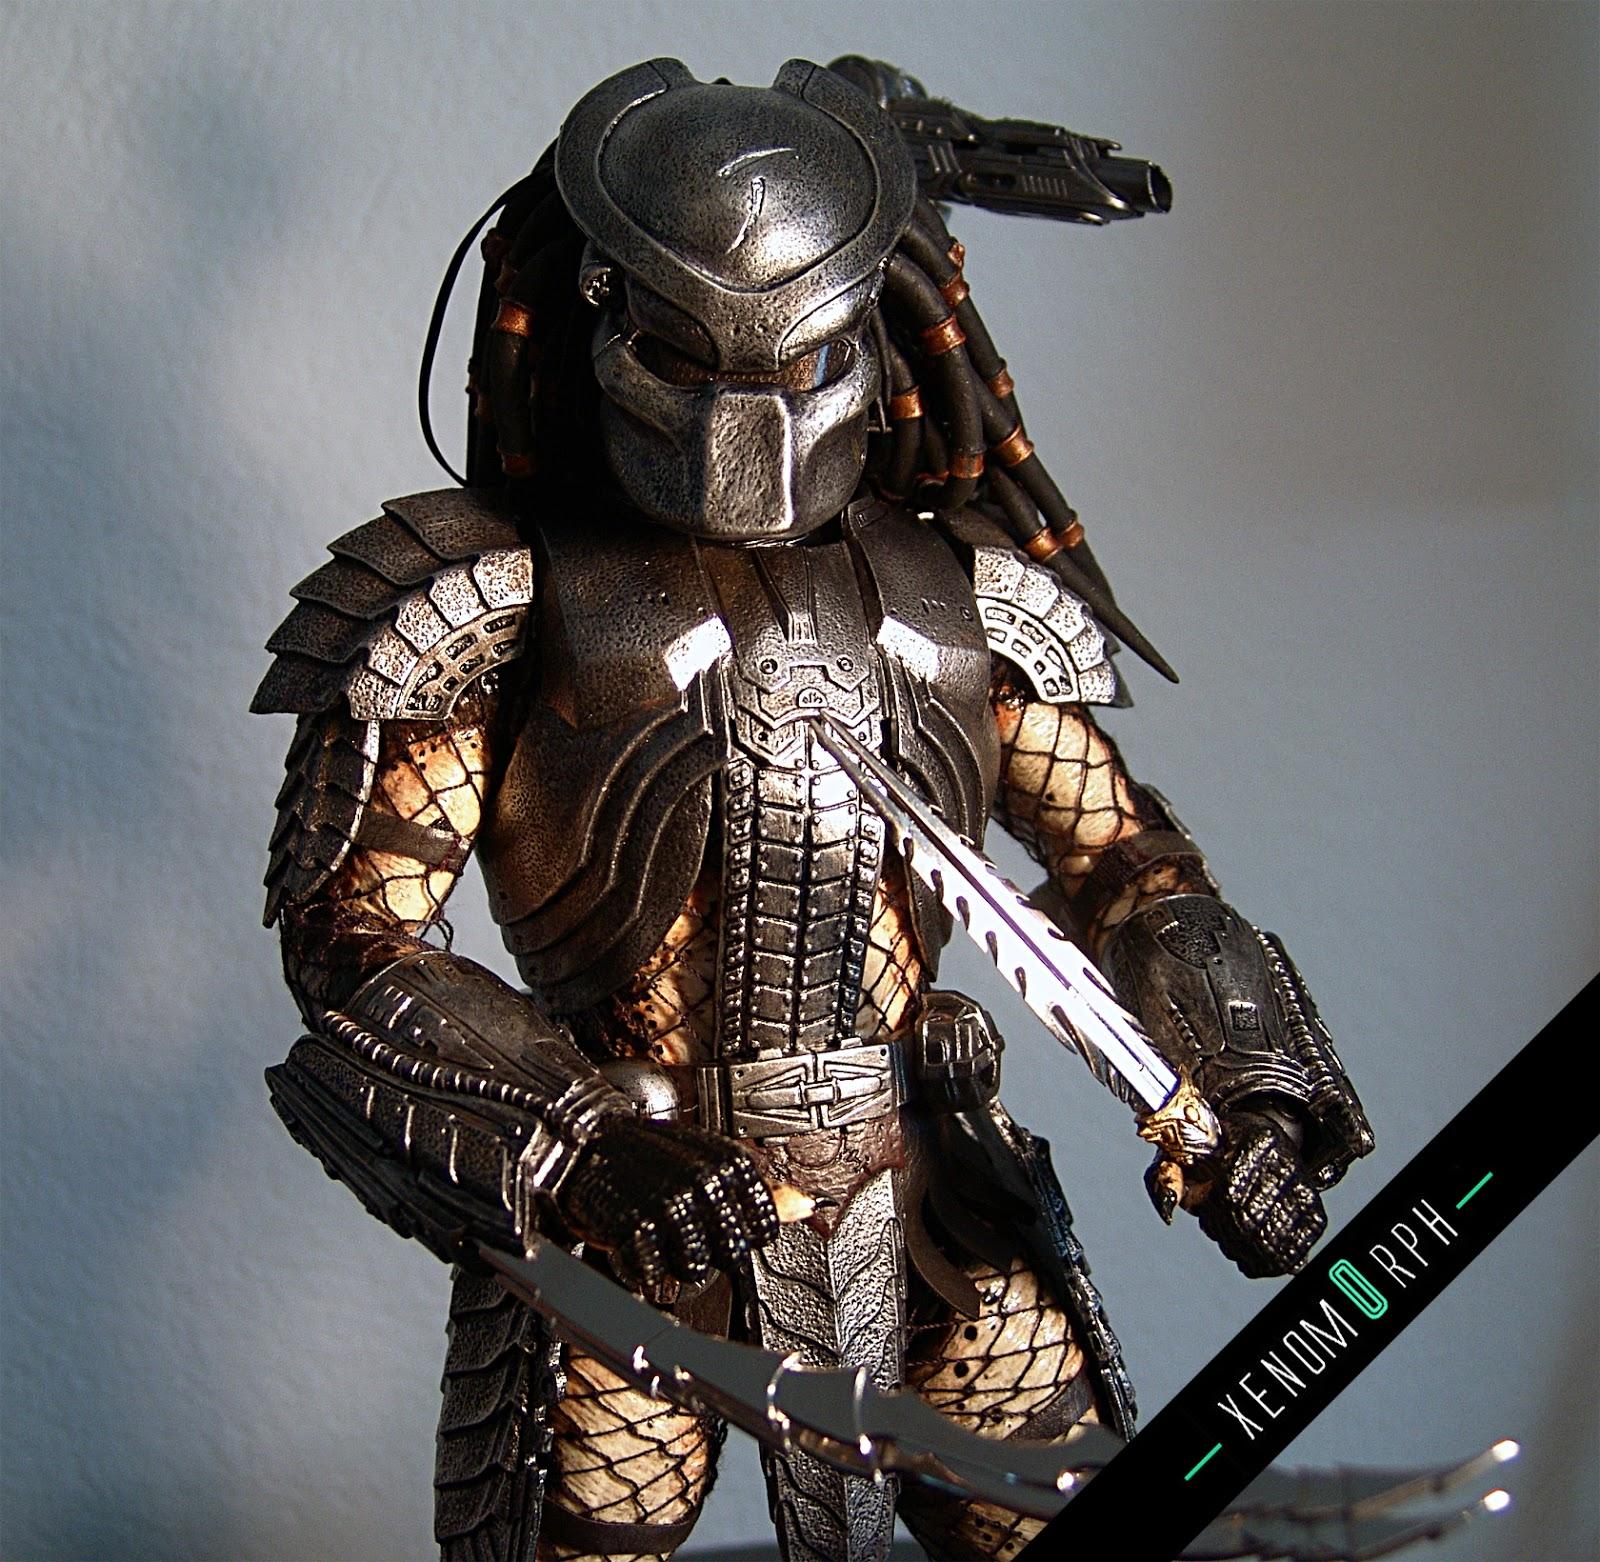 Review Predalien Alien Vs Predator: Requiem Hot Toys